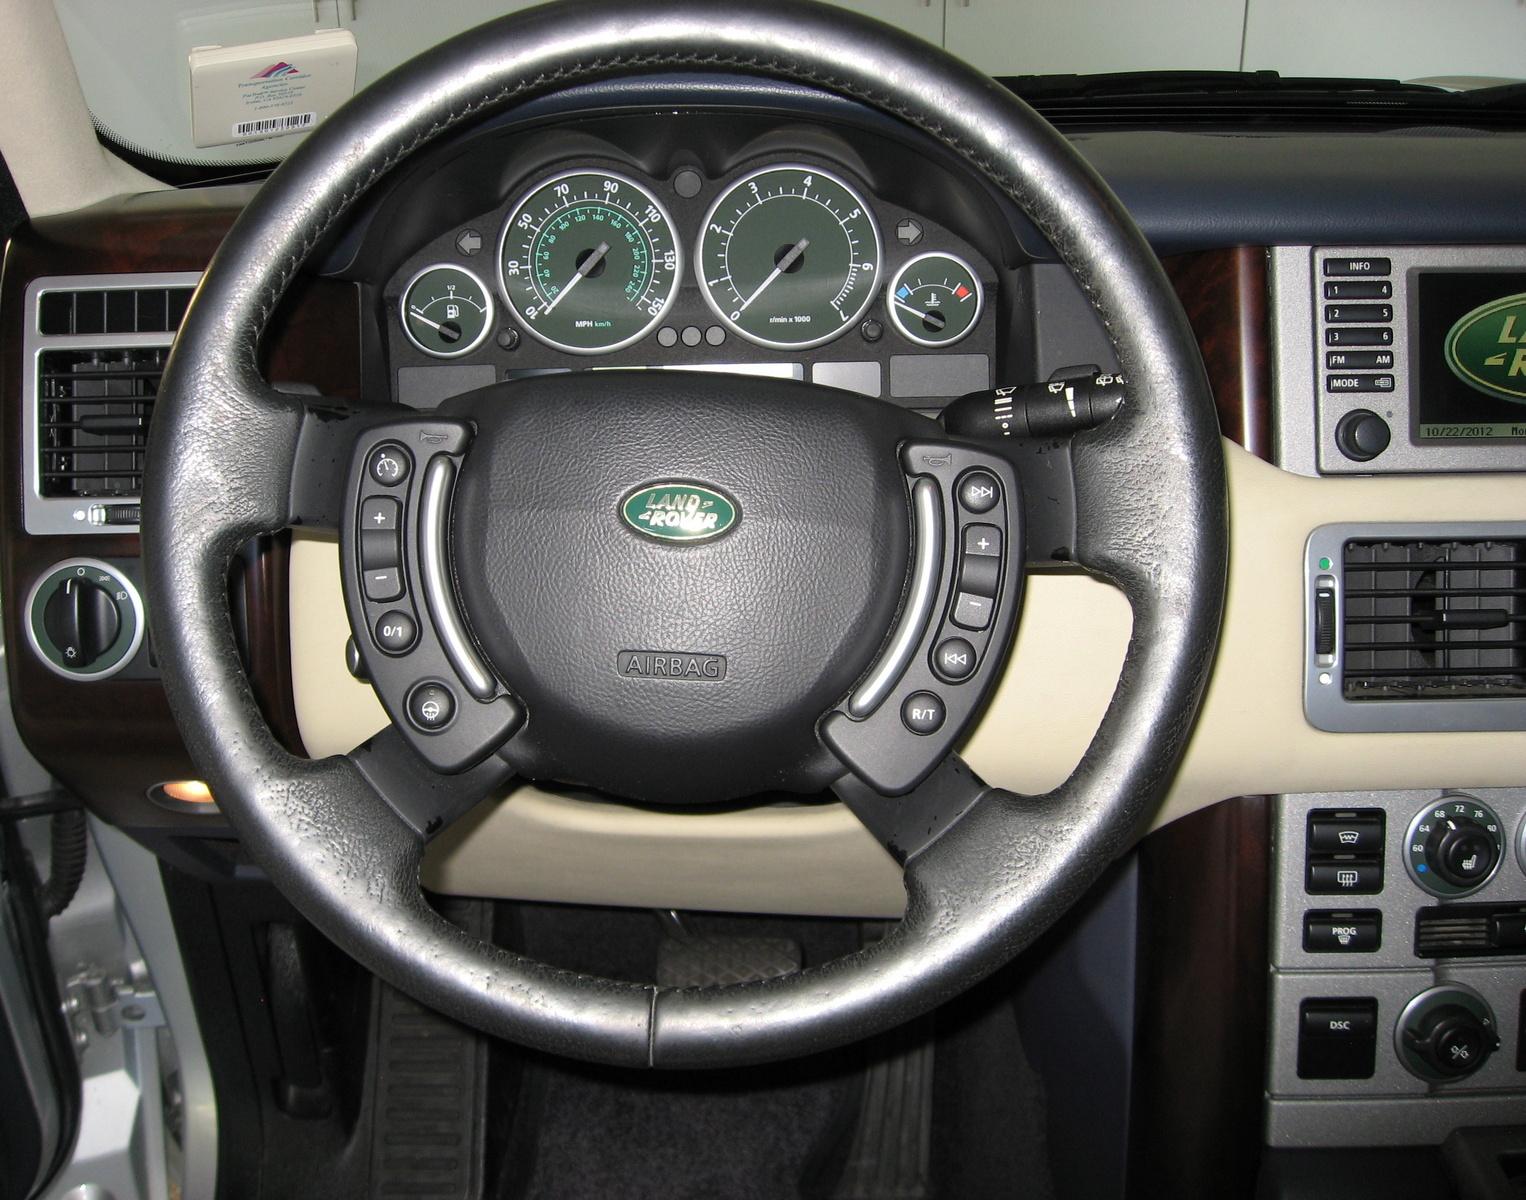 2004 range rover car interior design for 2004 range rover interior parts